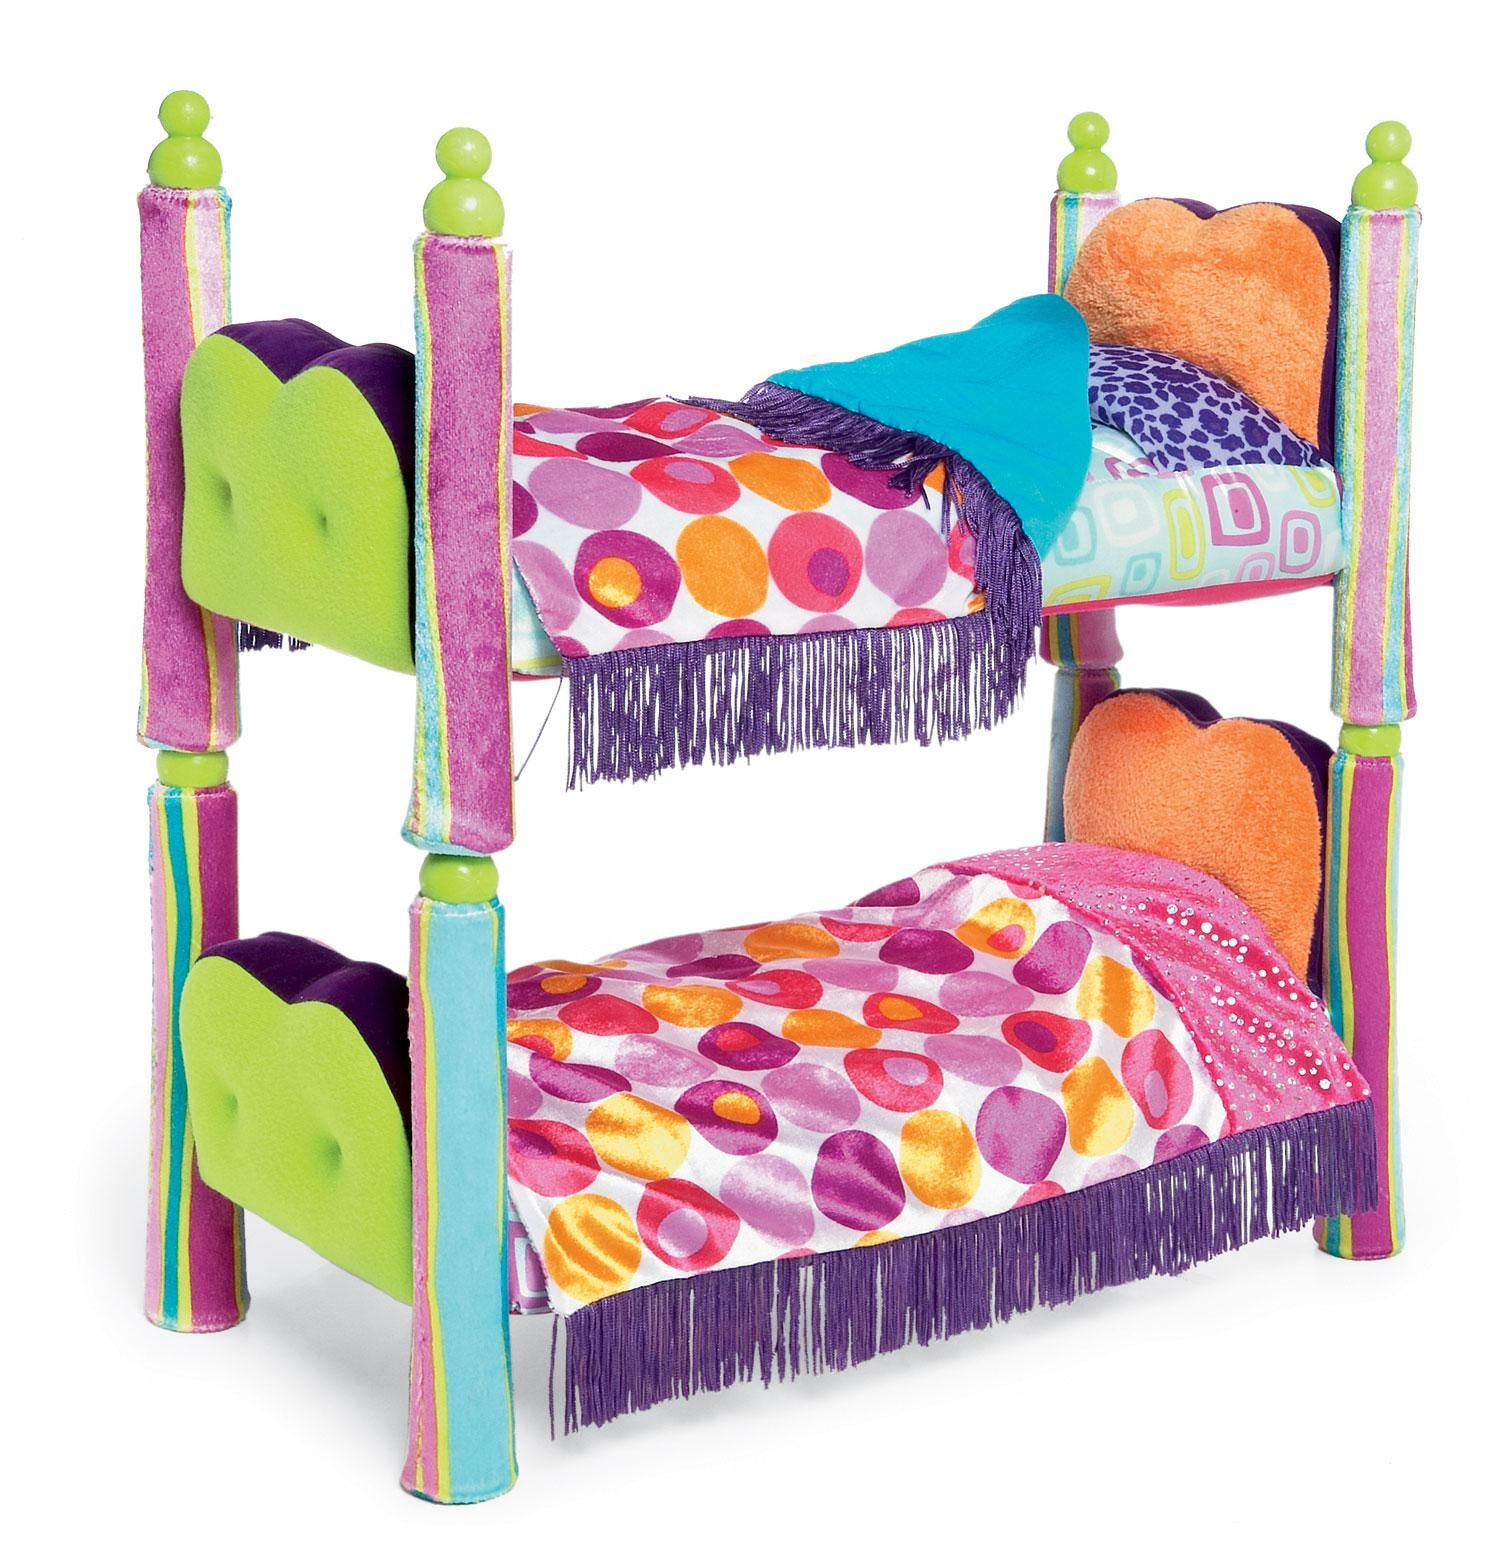 Groovy Girls Bombastic Bunk Bed Ideas For Santa Girls